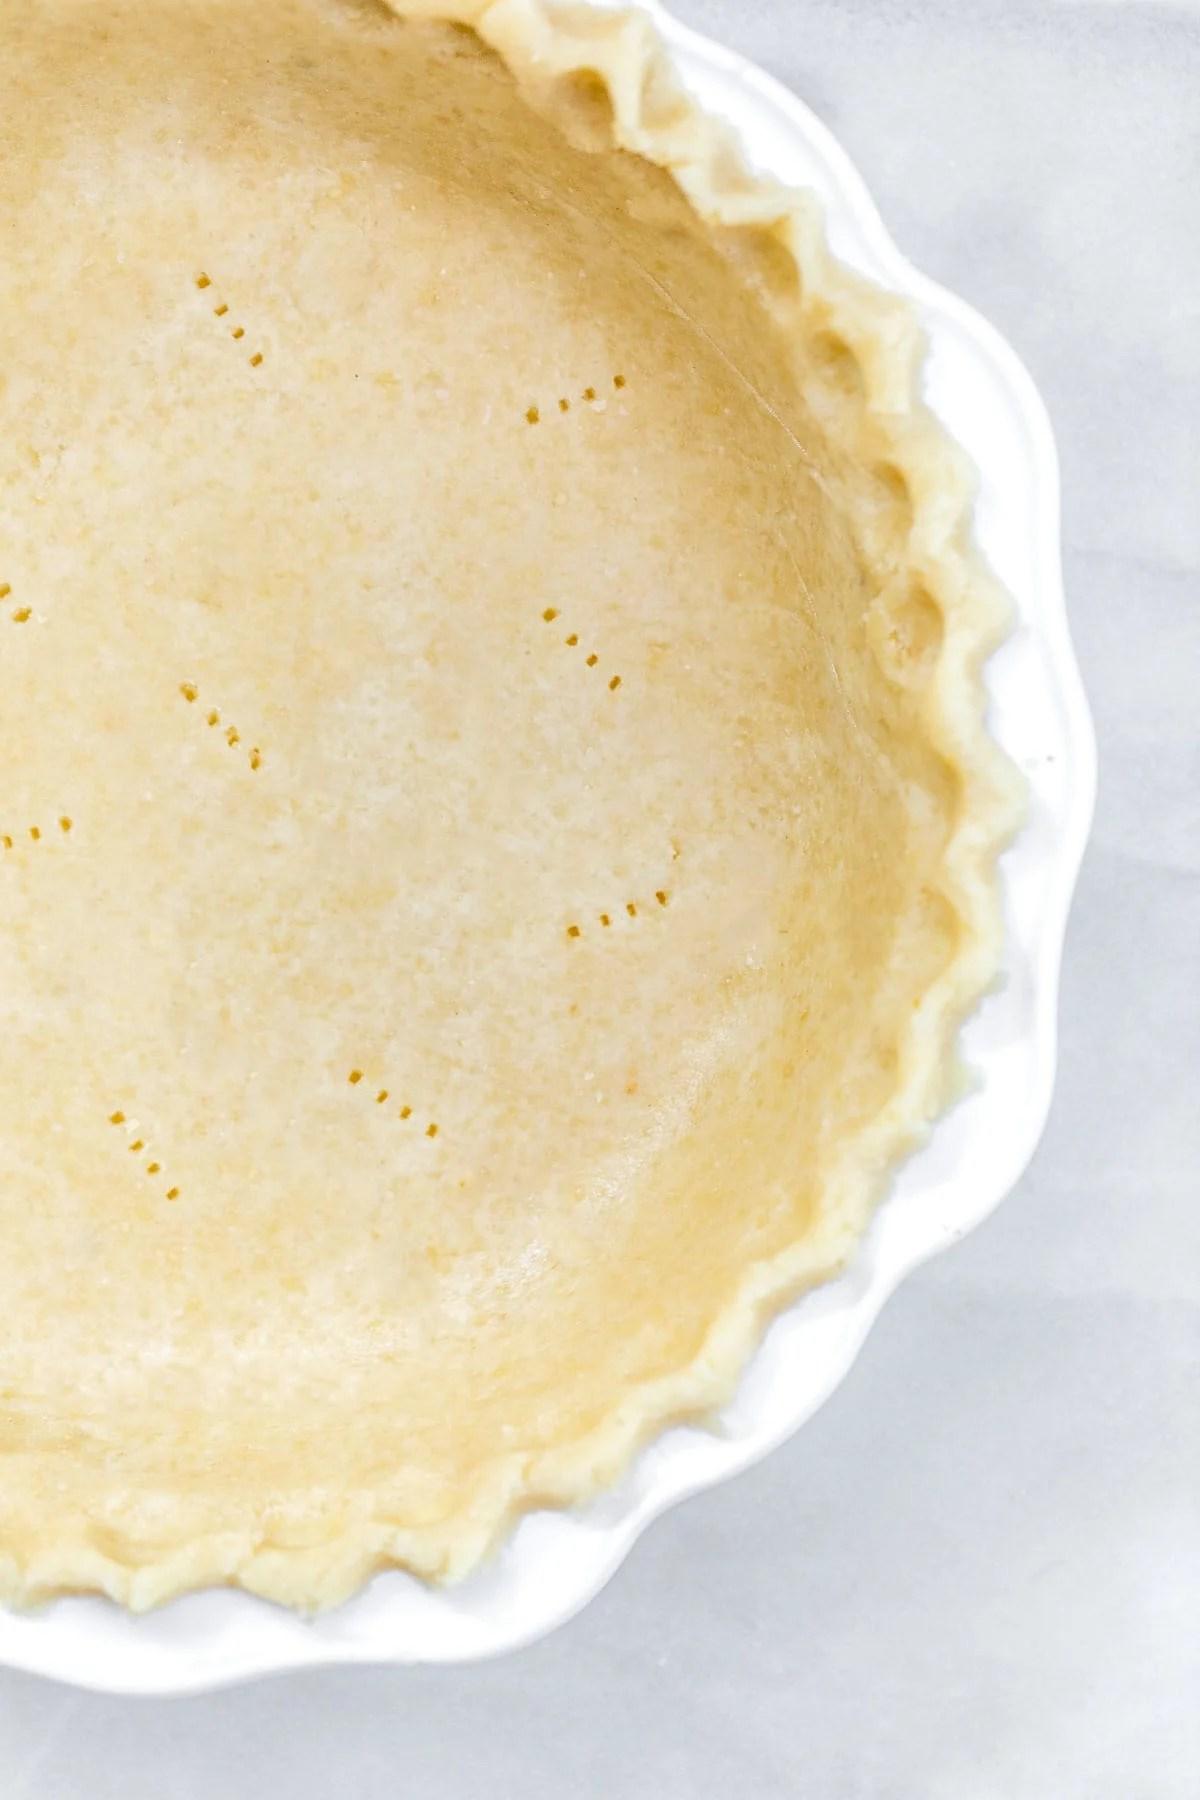 Gluten free pie crust in a white pie plate.